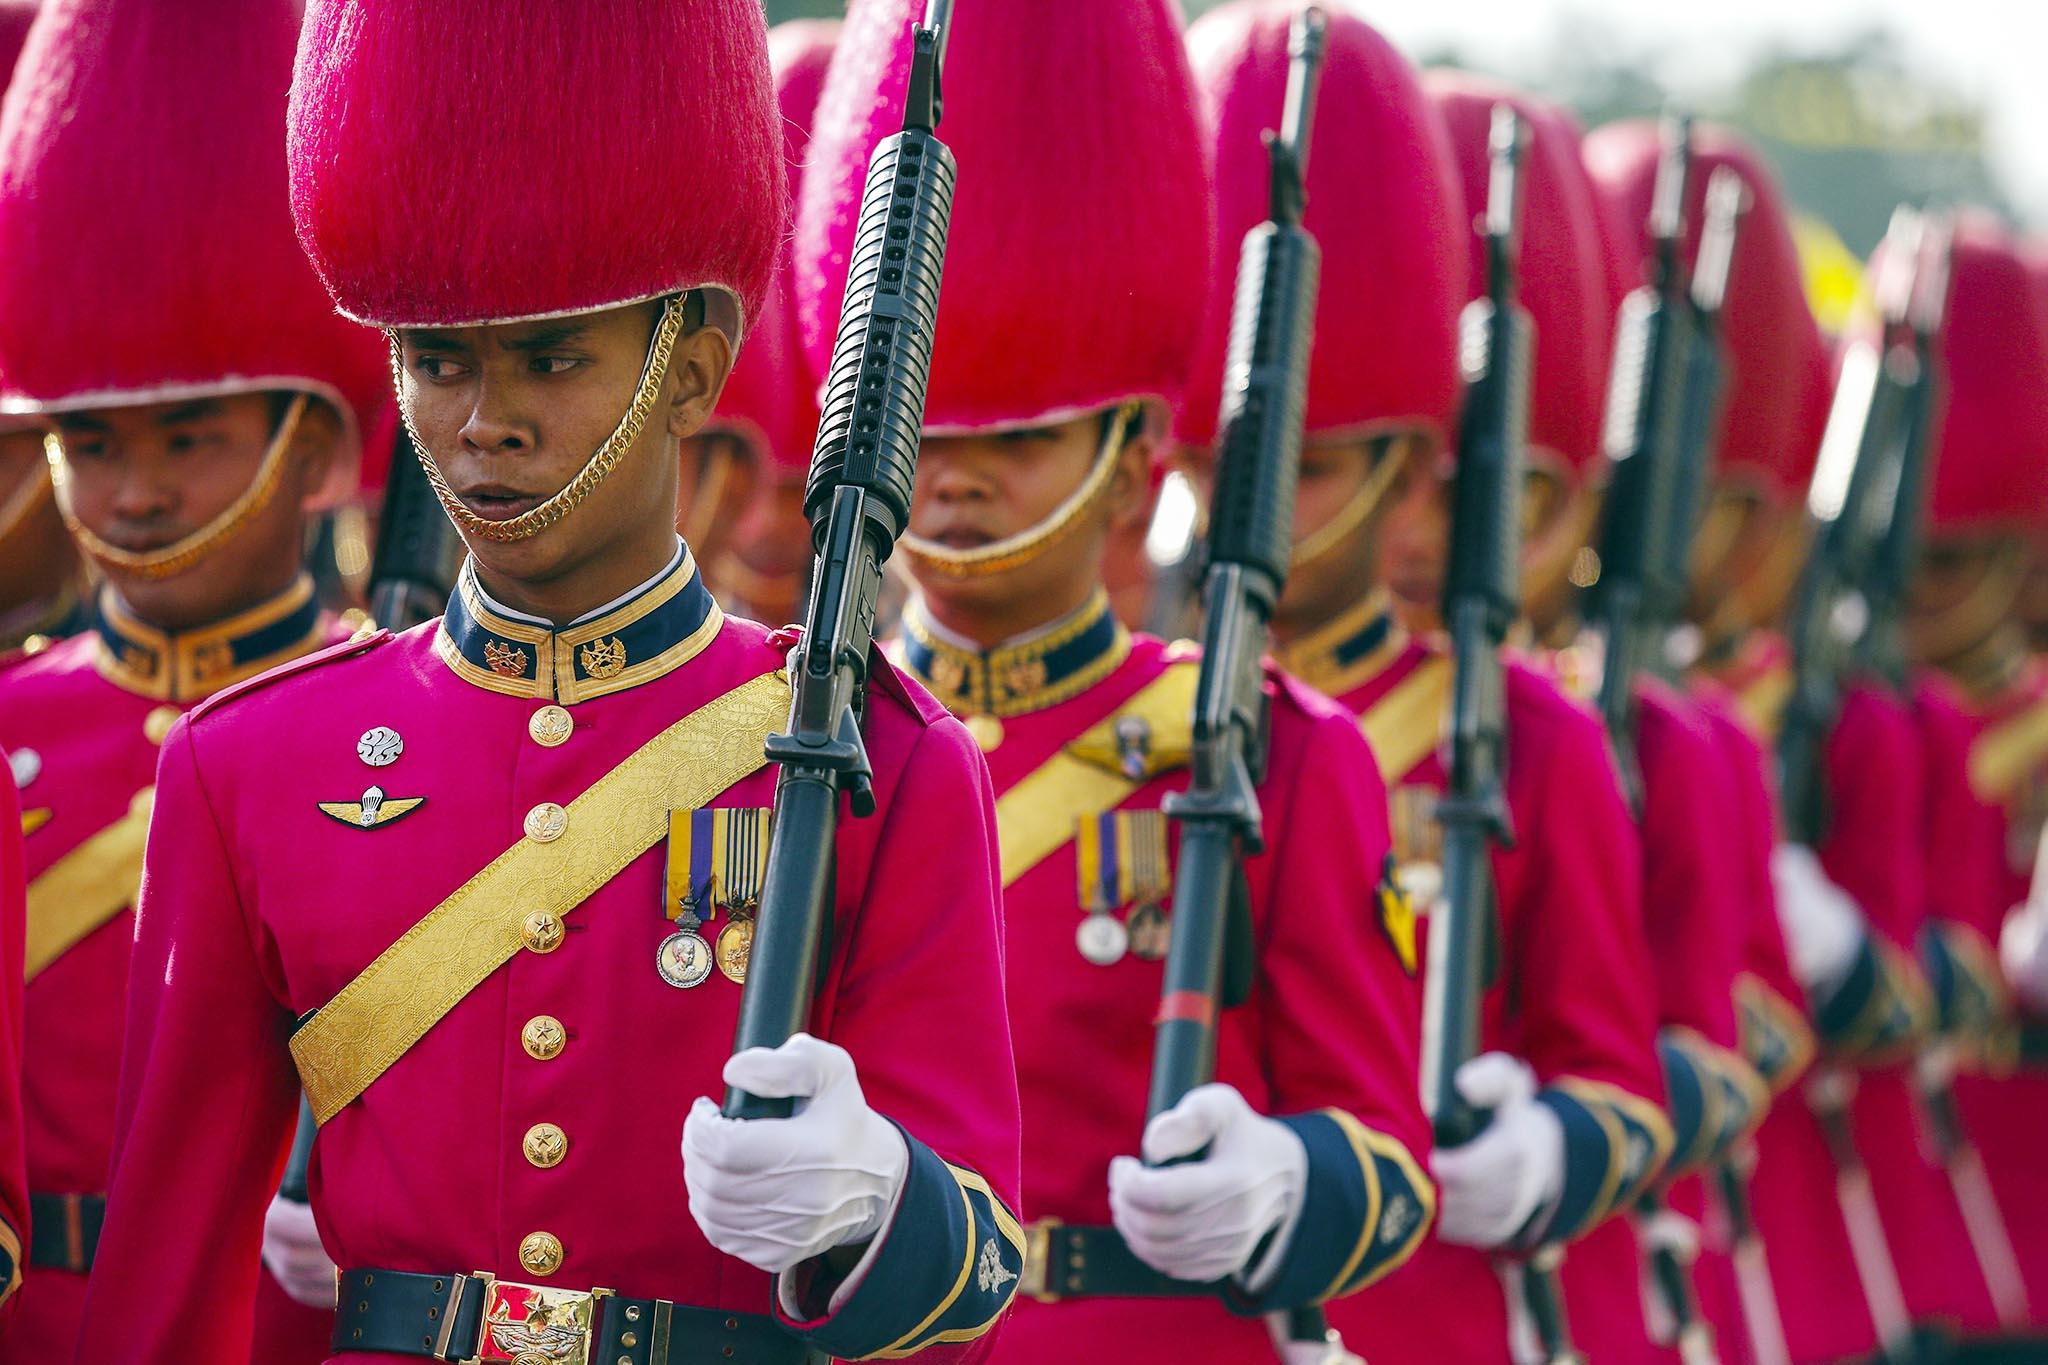 Thai royal guards of honour march during a parade to celebrate Thai King Bhumibol Adulyadej's 86th birthday at Klai Kangwon Palace, Hua Hin